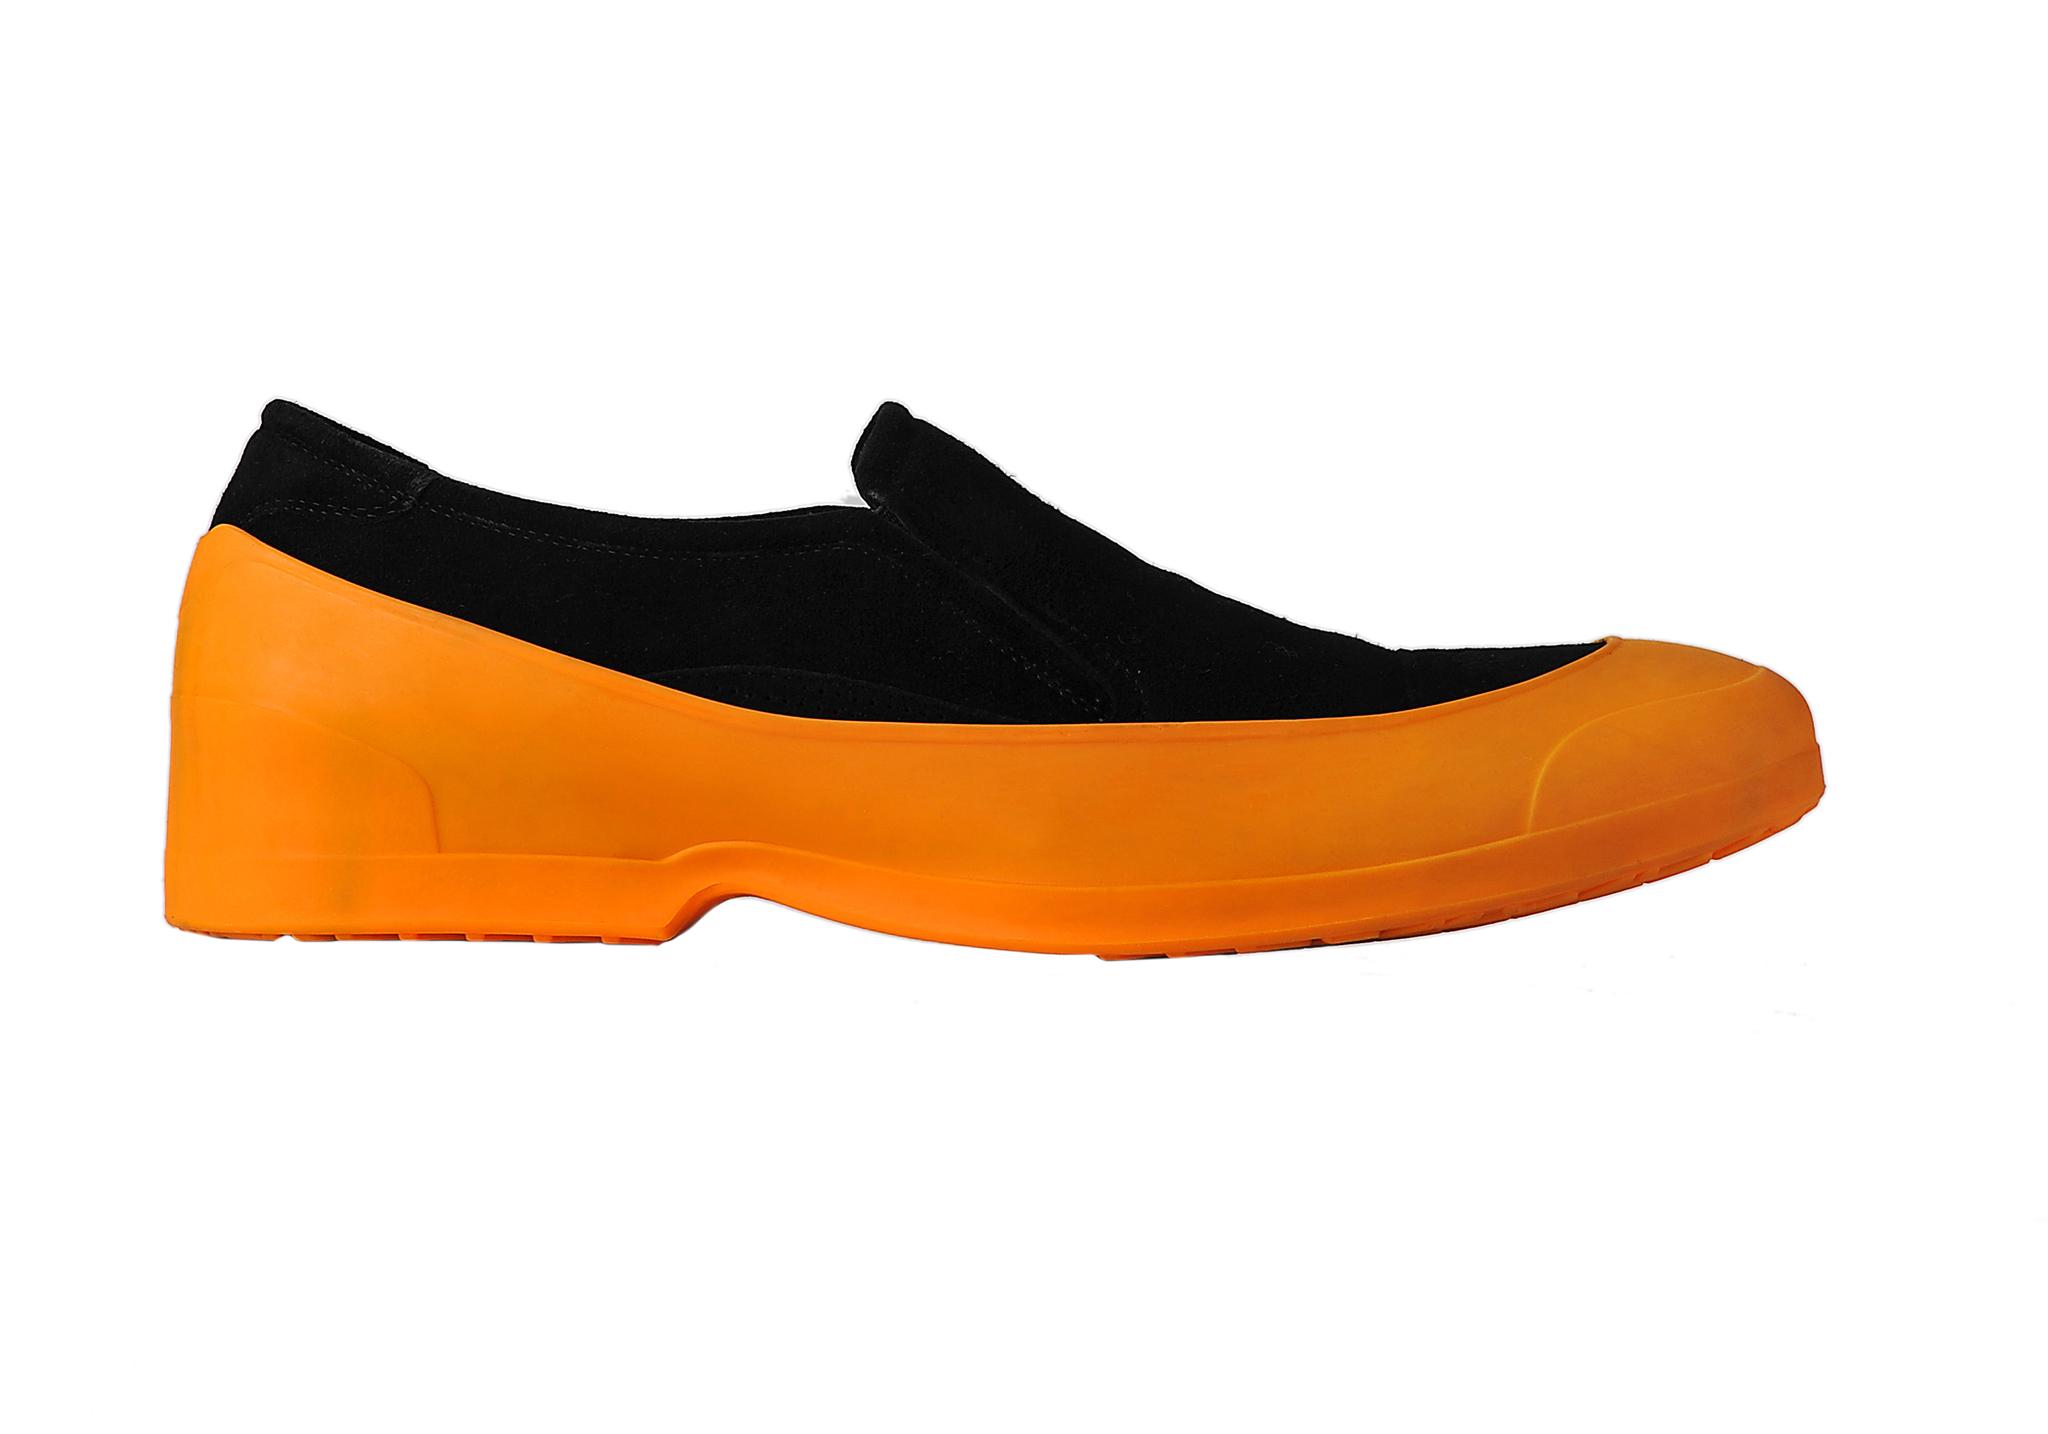 Галоши Мужские галоши открытого типа цвет оранж DSC_0005.jpg